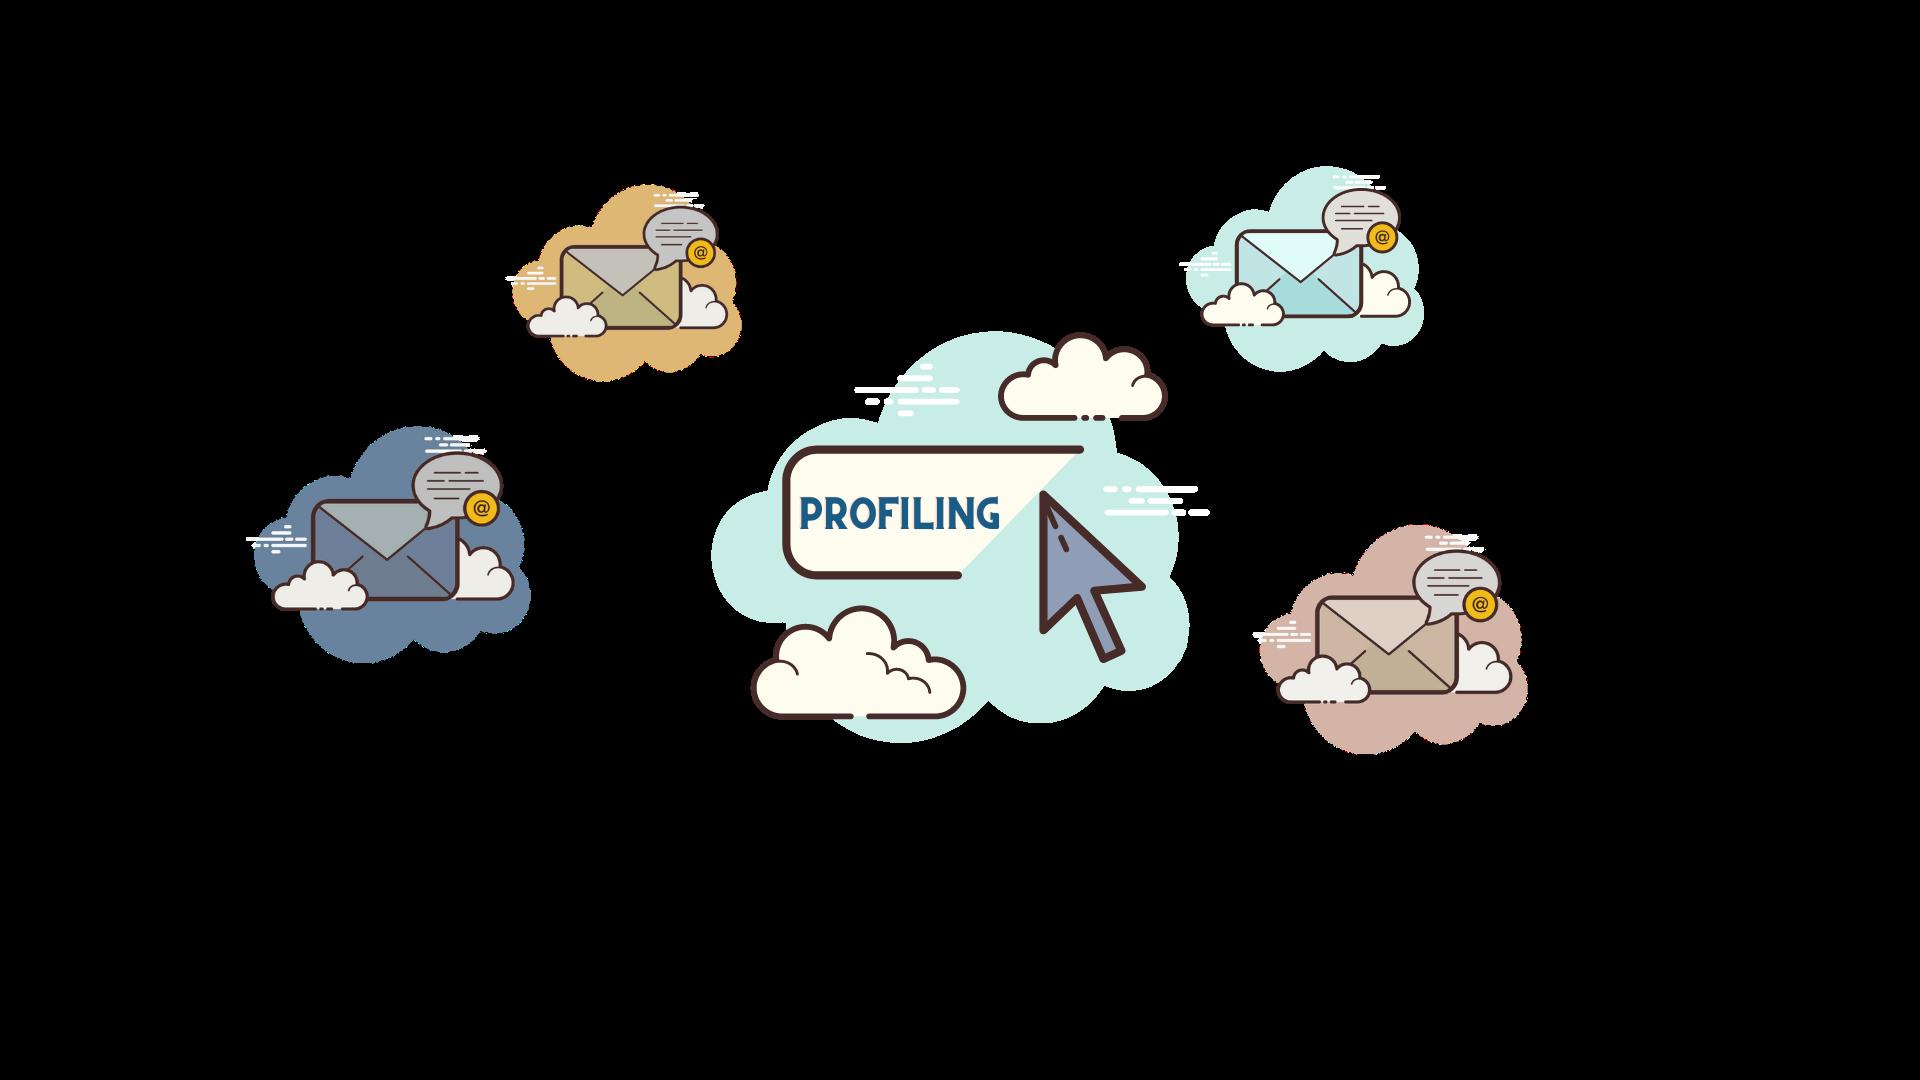 Profiling and GDPR